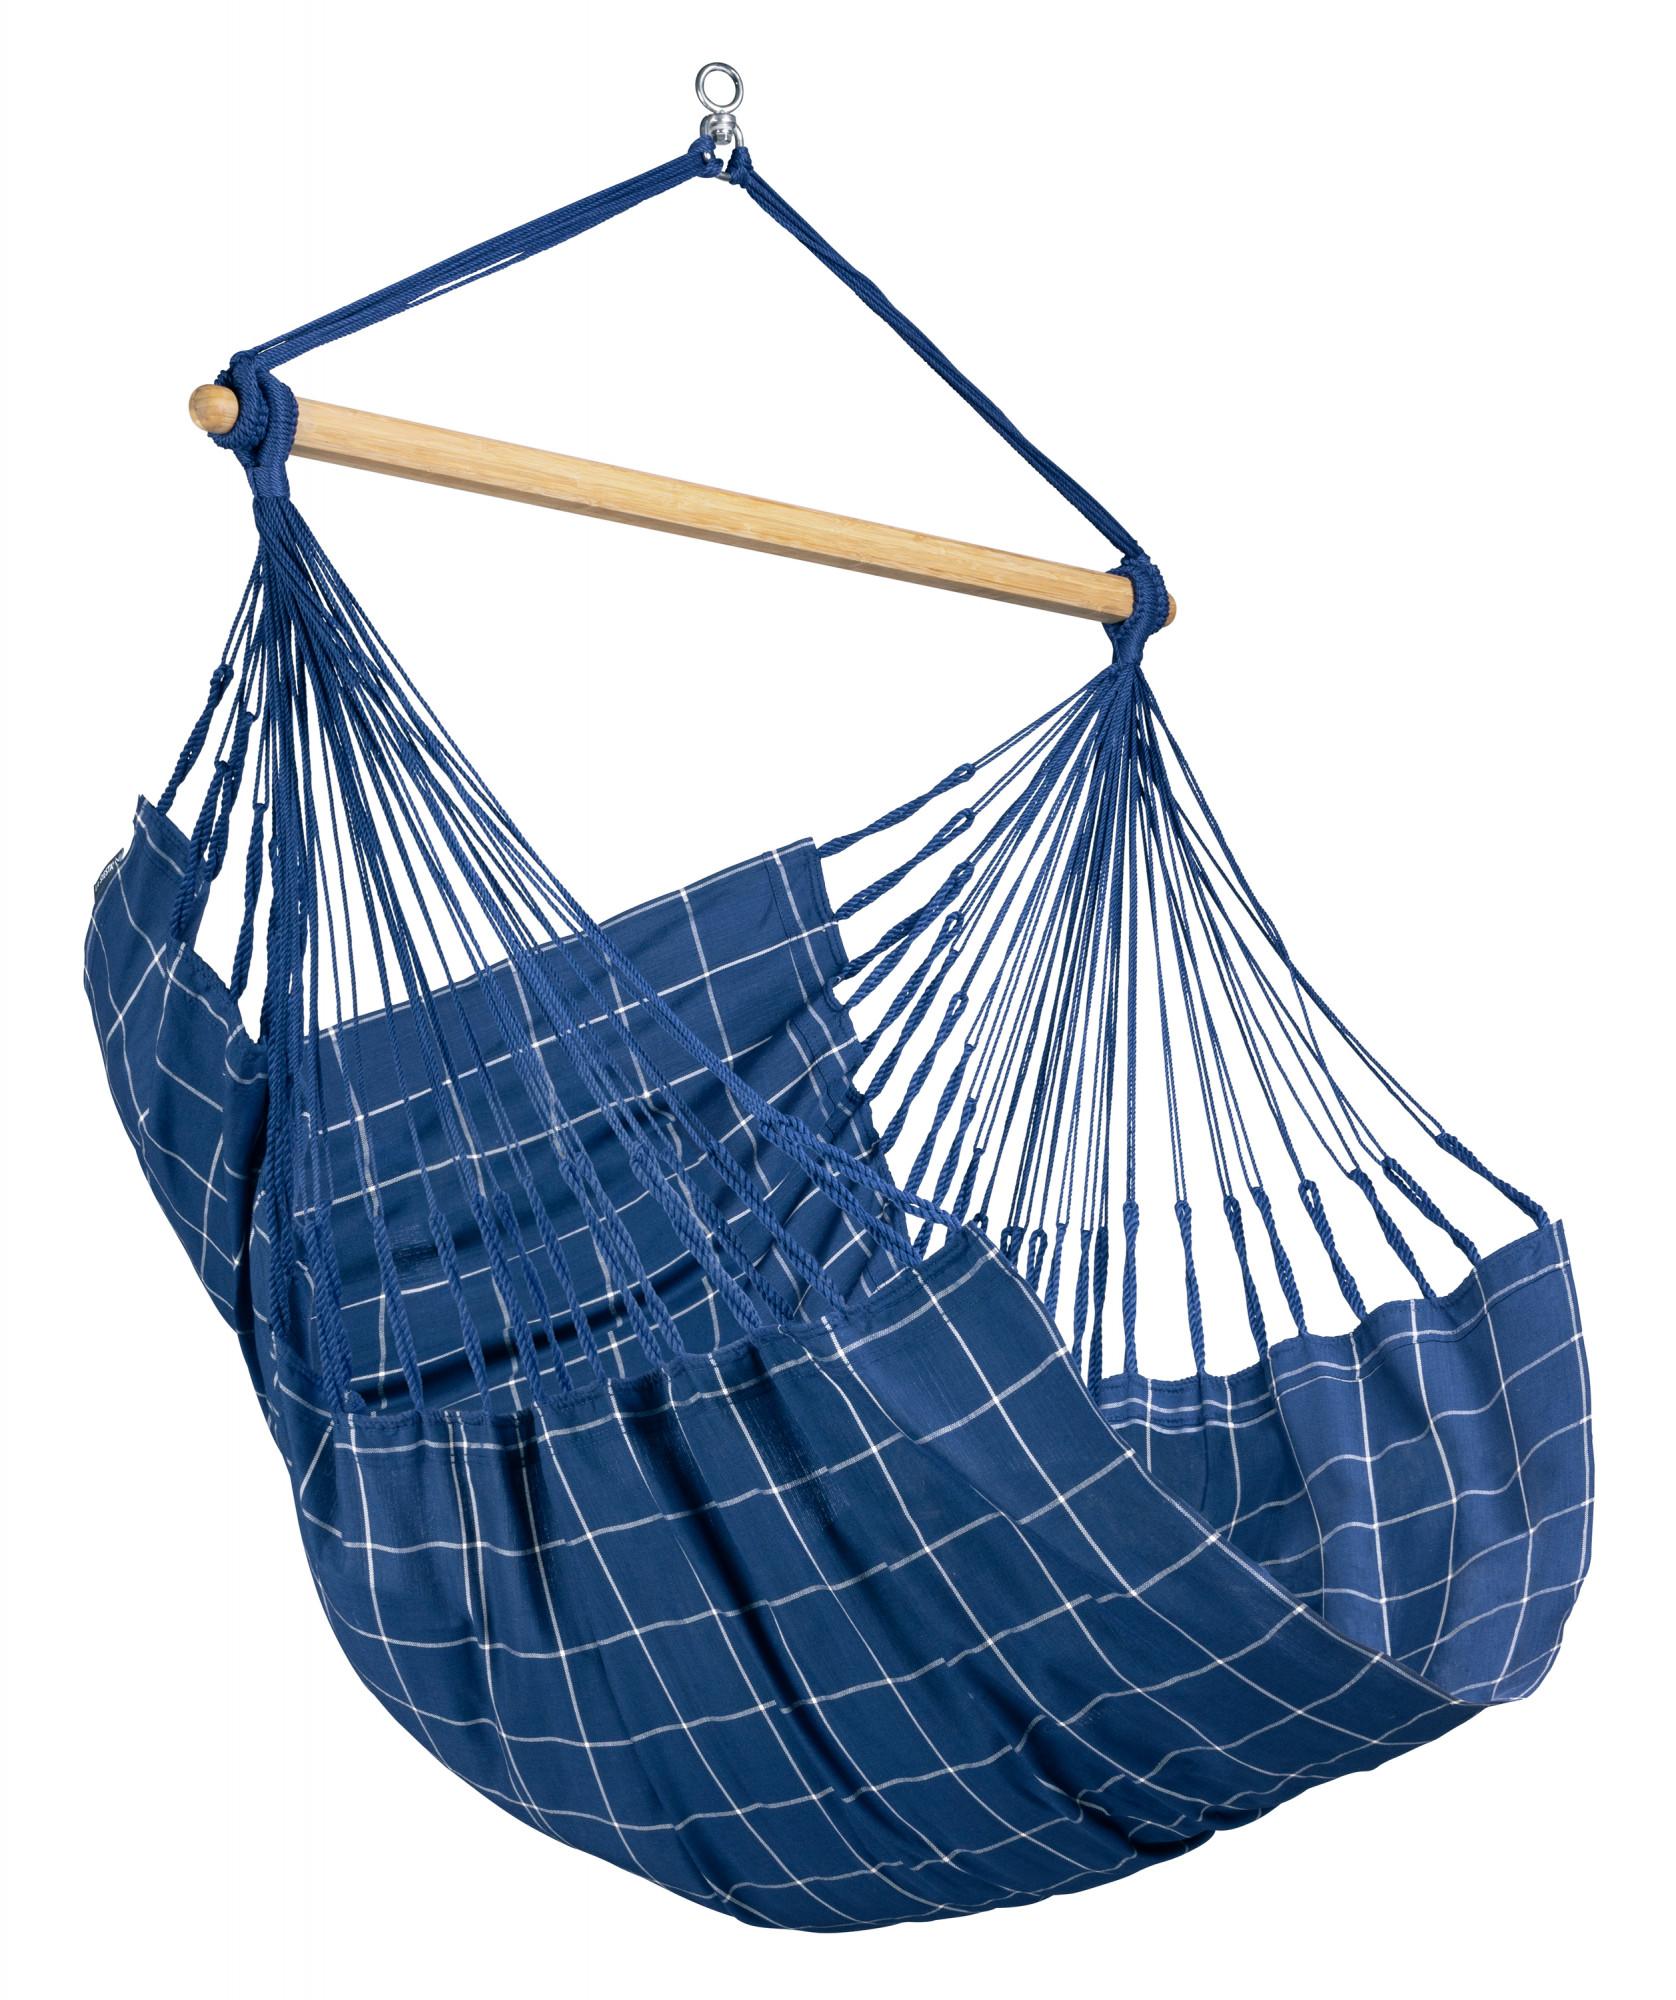 Chaise-hamac comfort en tissu bleu marine